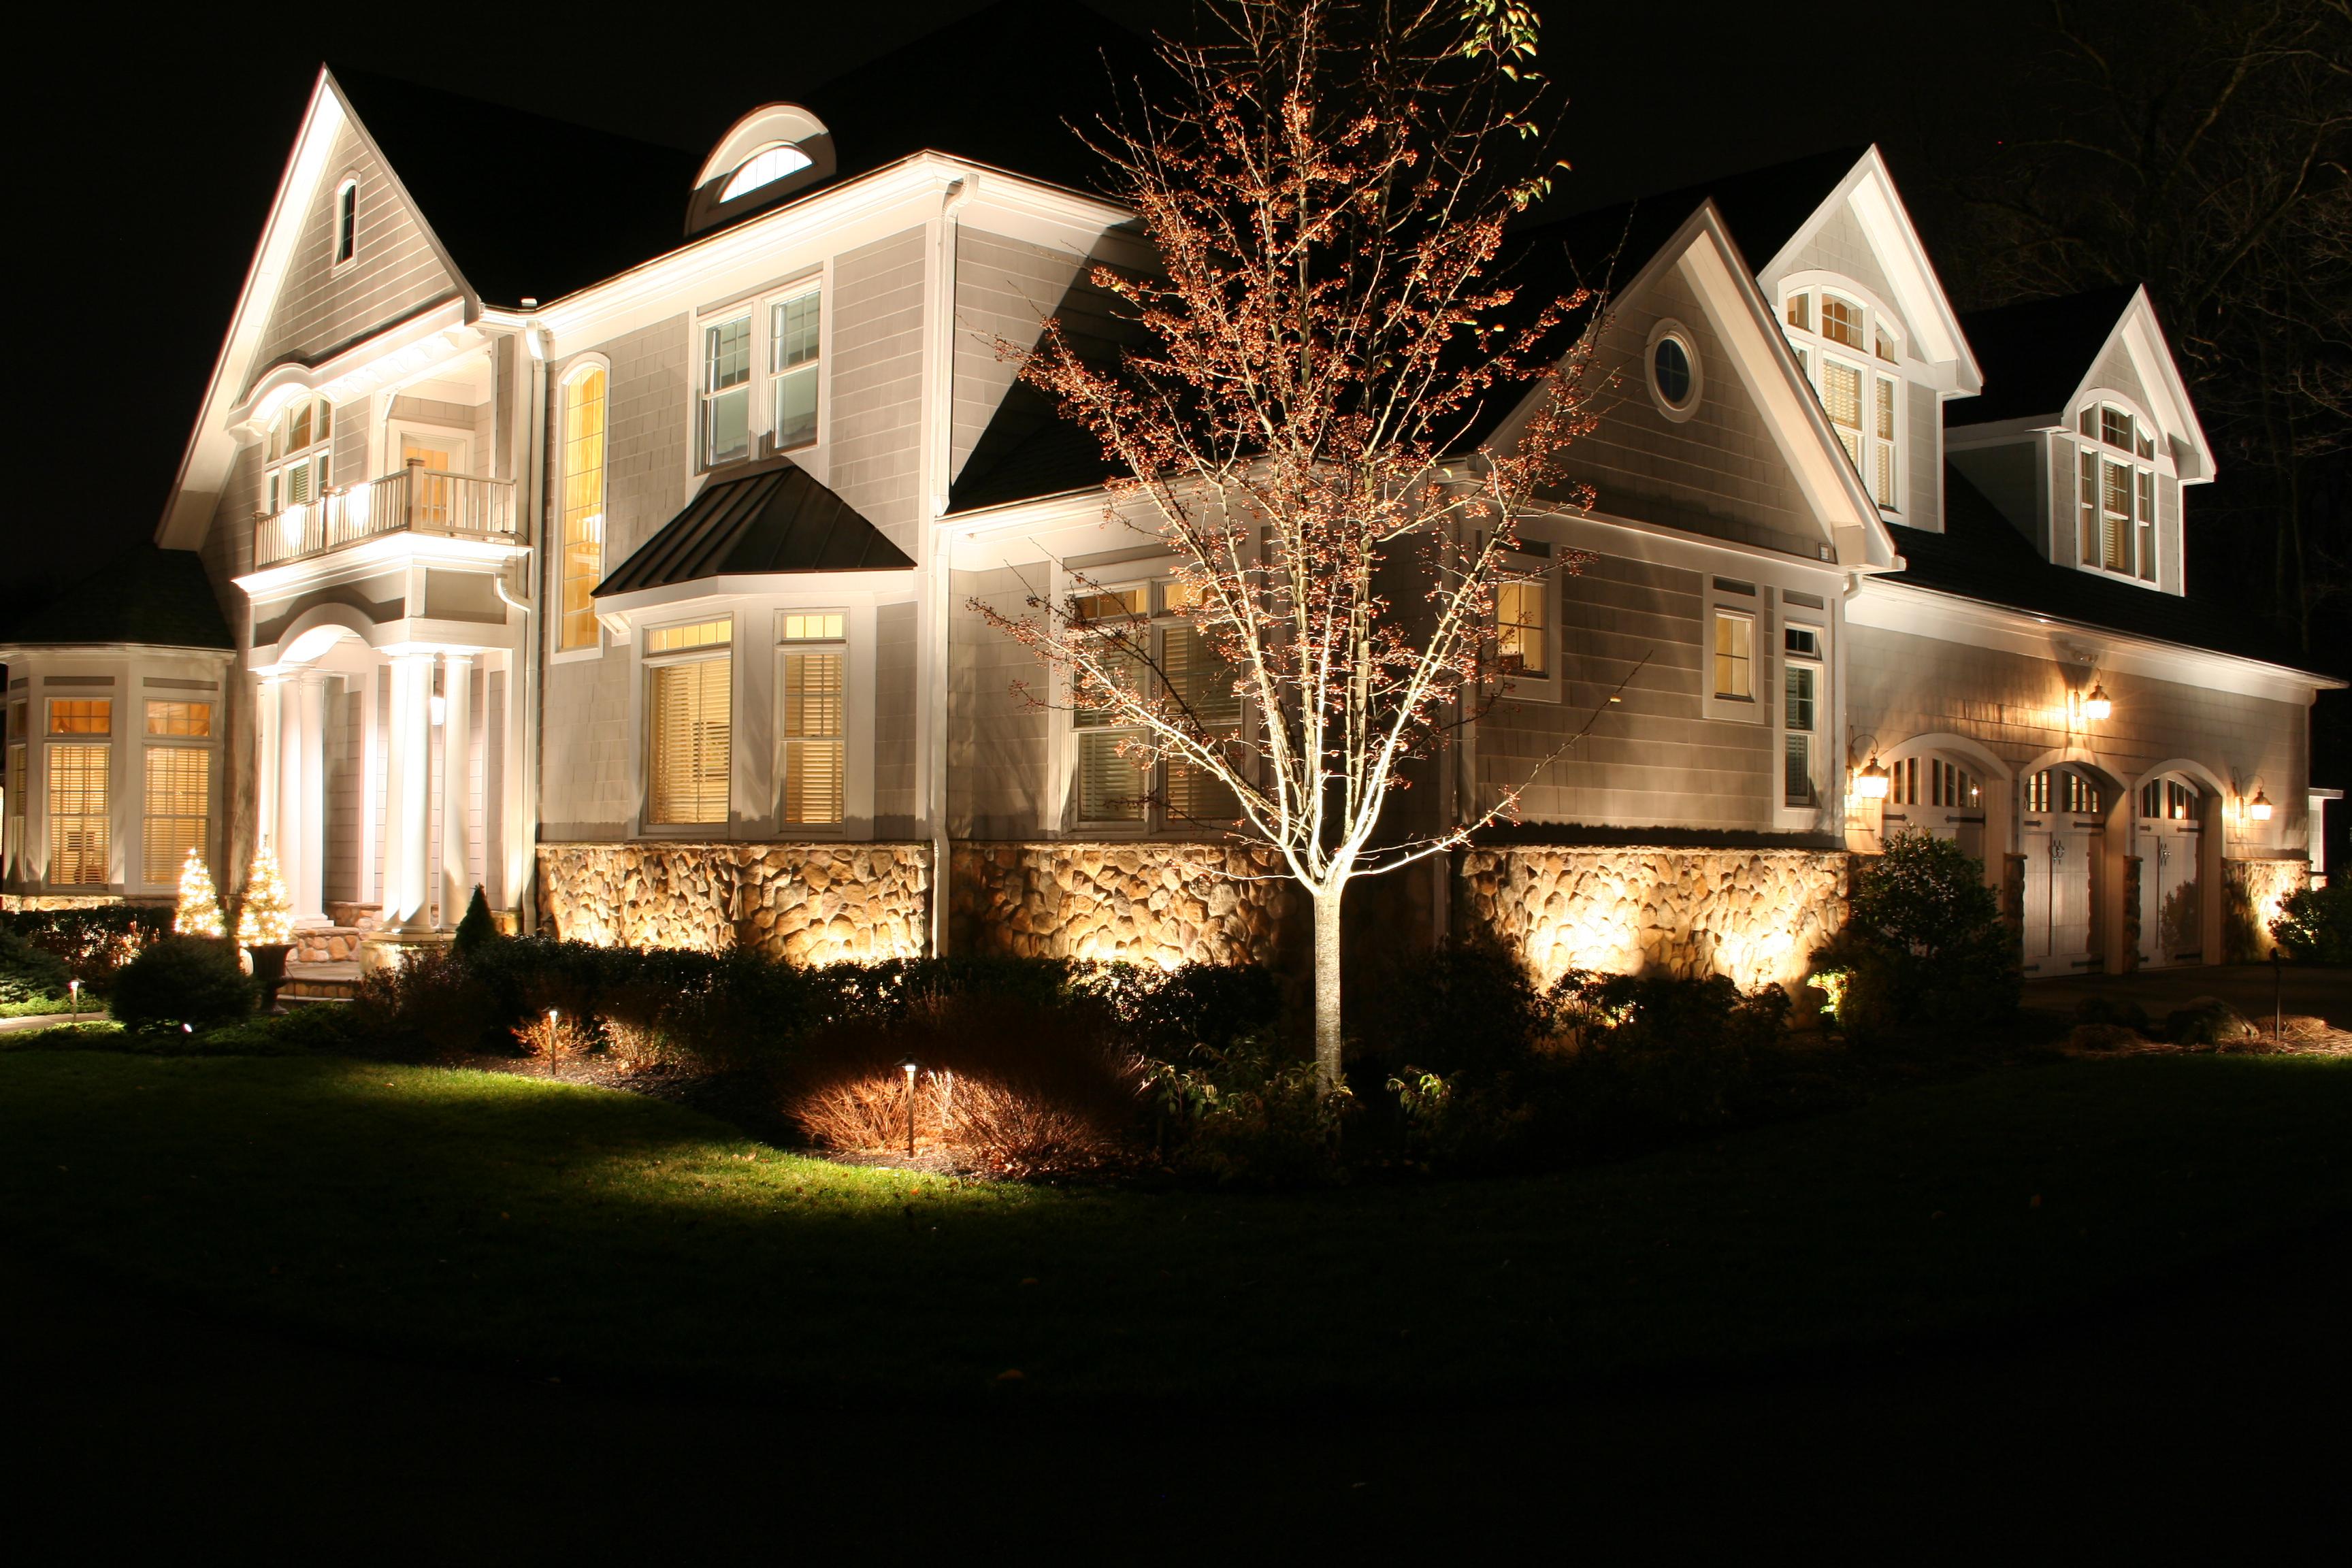 landscape-lighting-jal-landscaping-ideas-outdoor-design-2017-architecture-likable-home-house-photos-